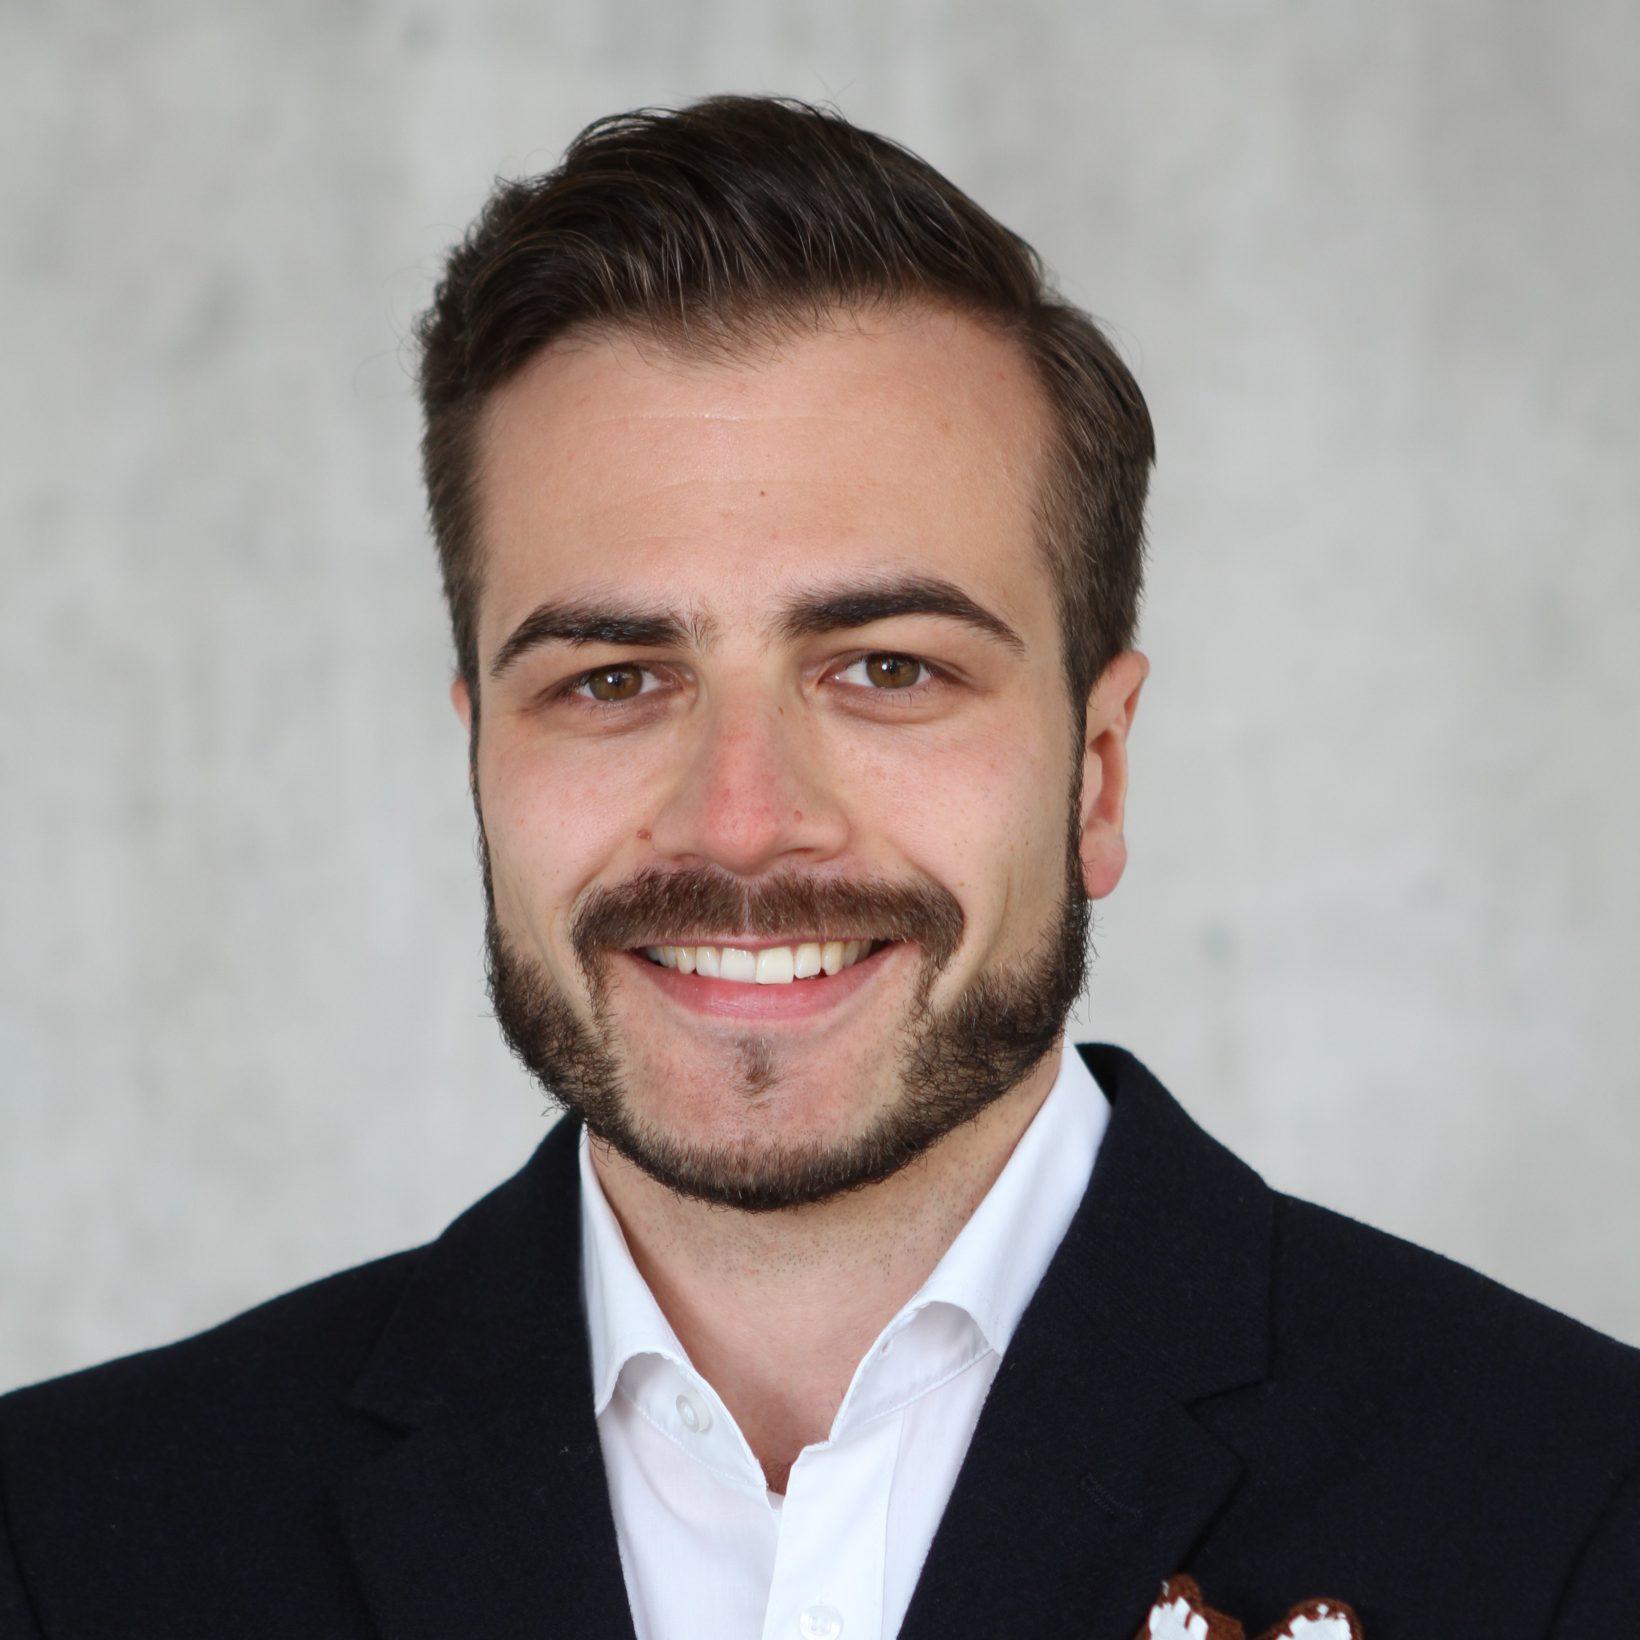 Fabio Duma